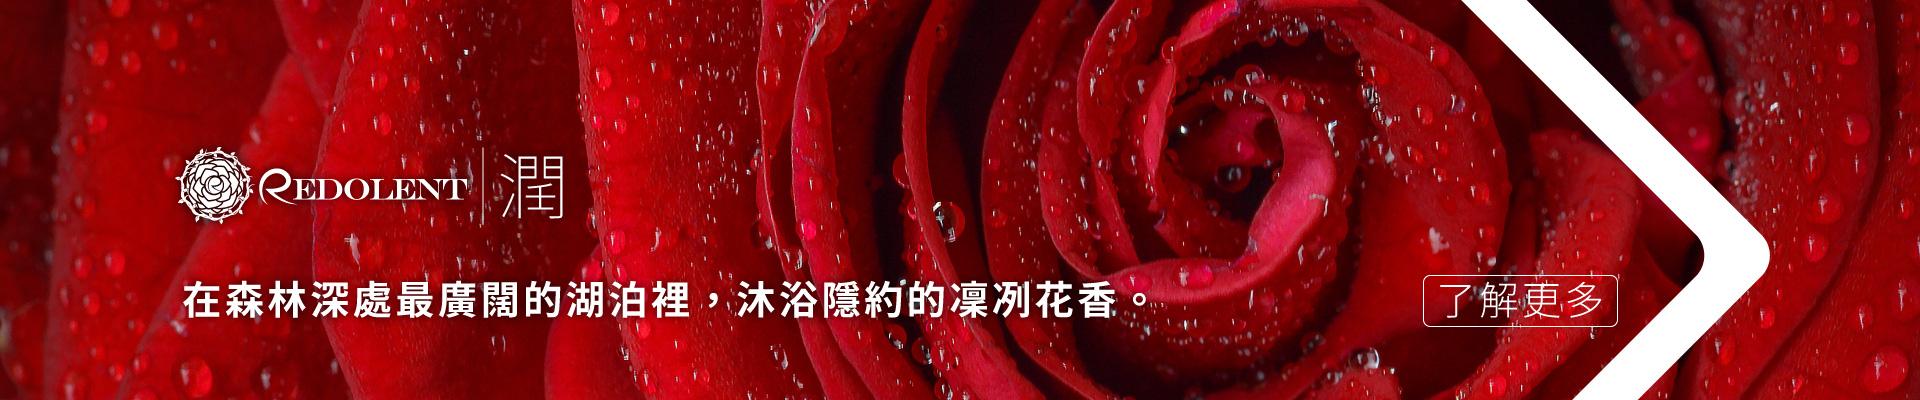 Redolent 花雨 |潤 :在森林深處最廣闊的湖泊裡,沐浴隱約的凜冽花香。